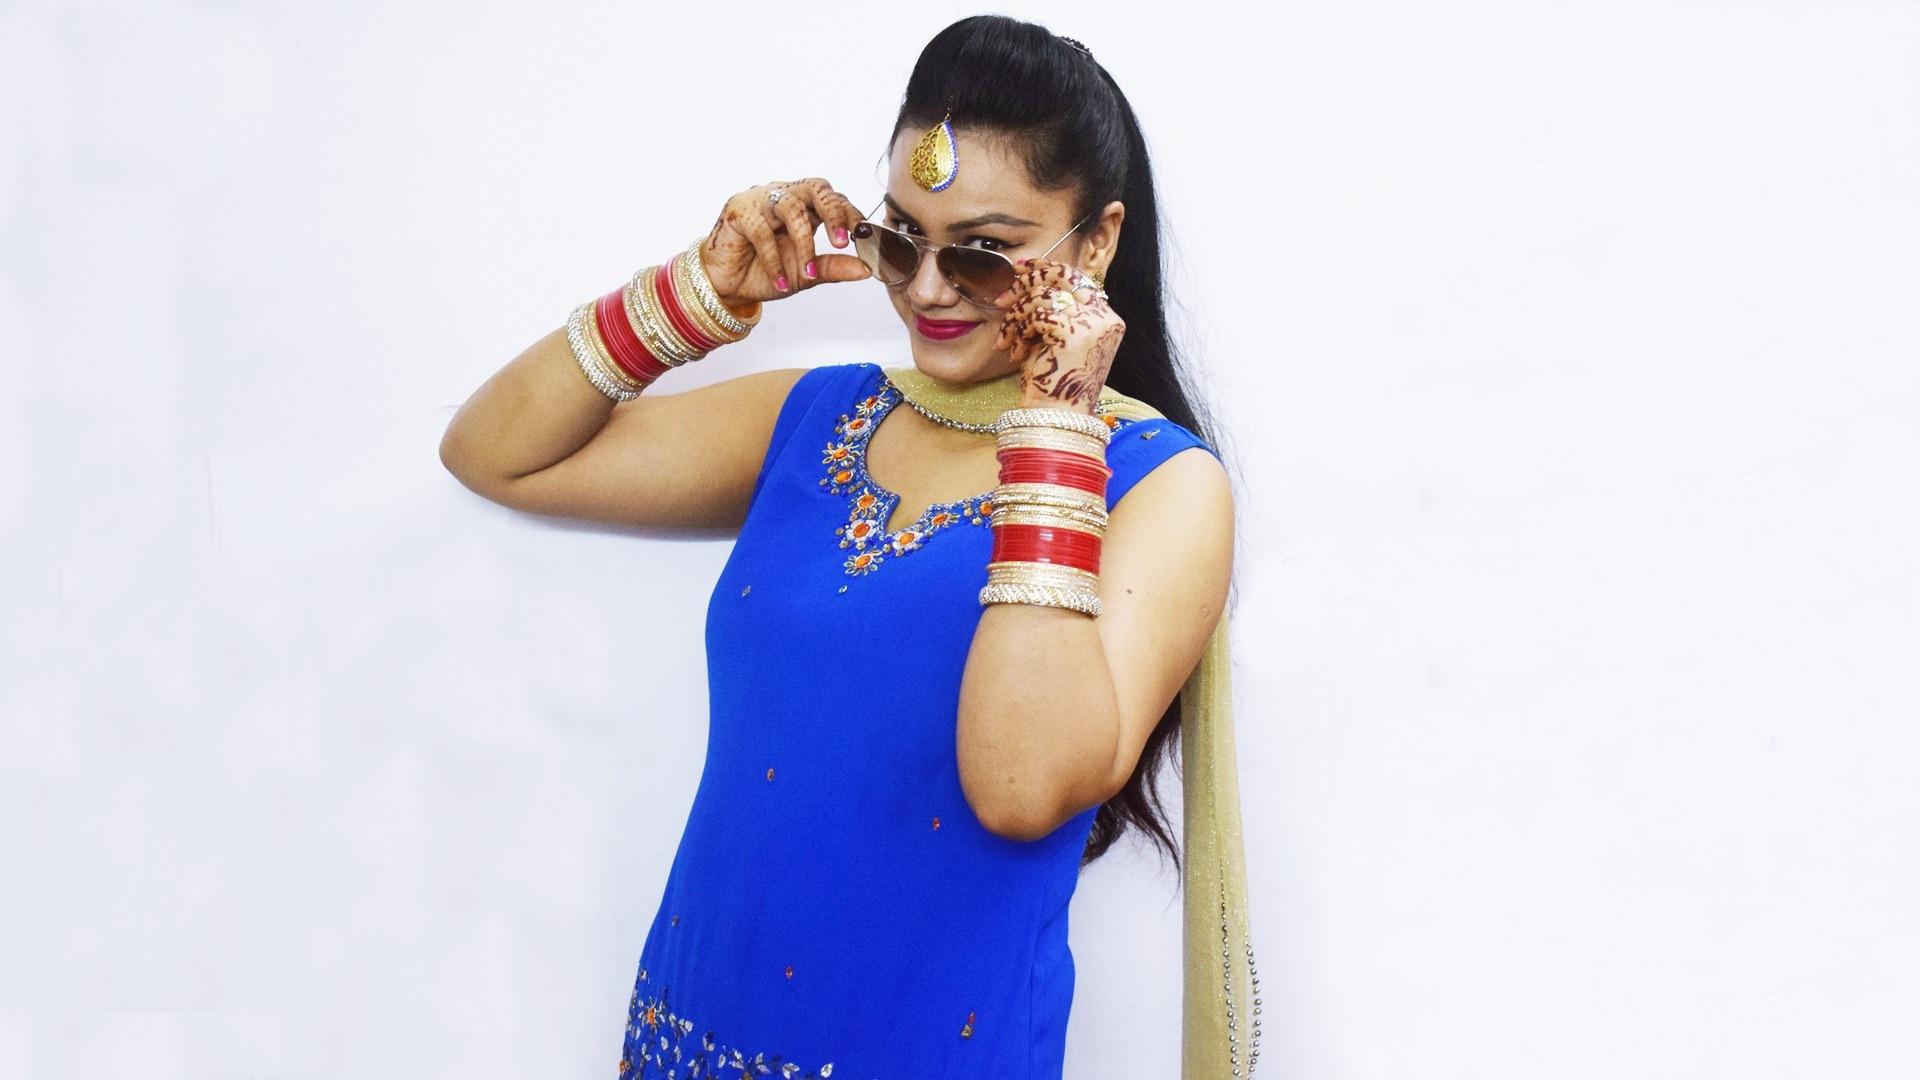 Surbhi Kaur High Definition Wallpaper 41438